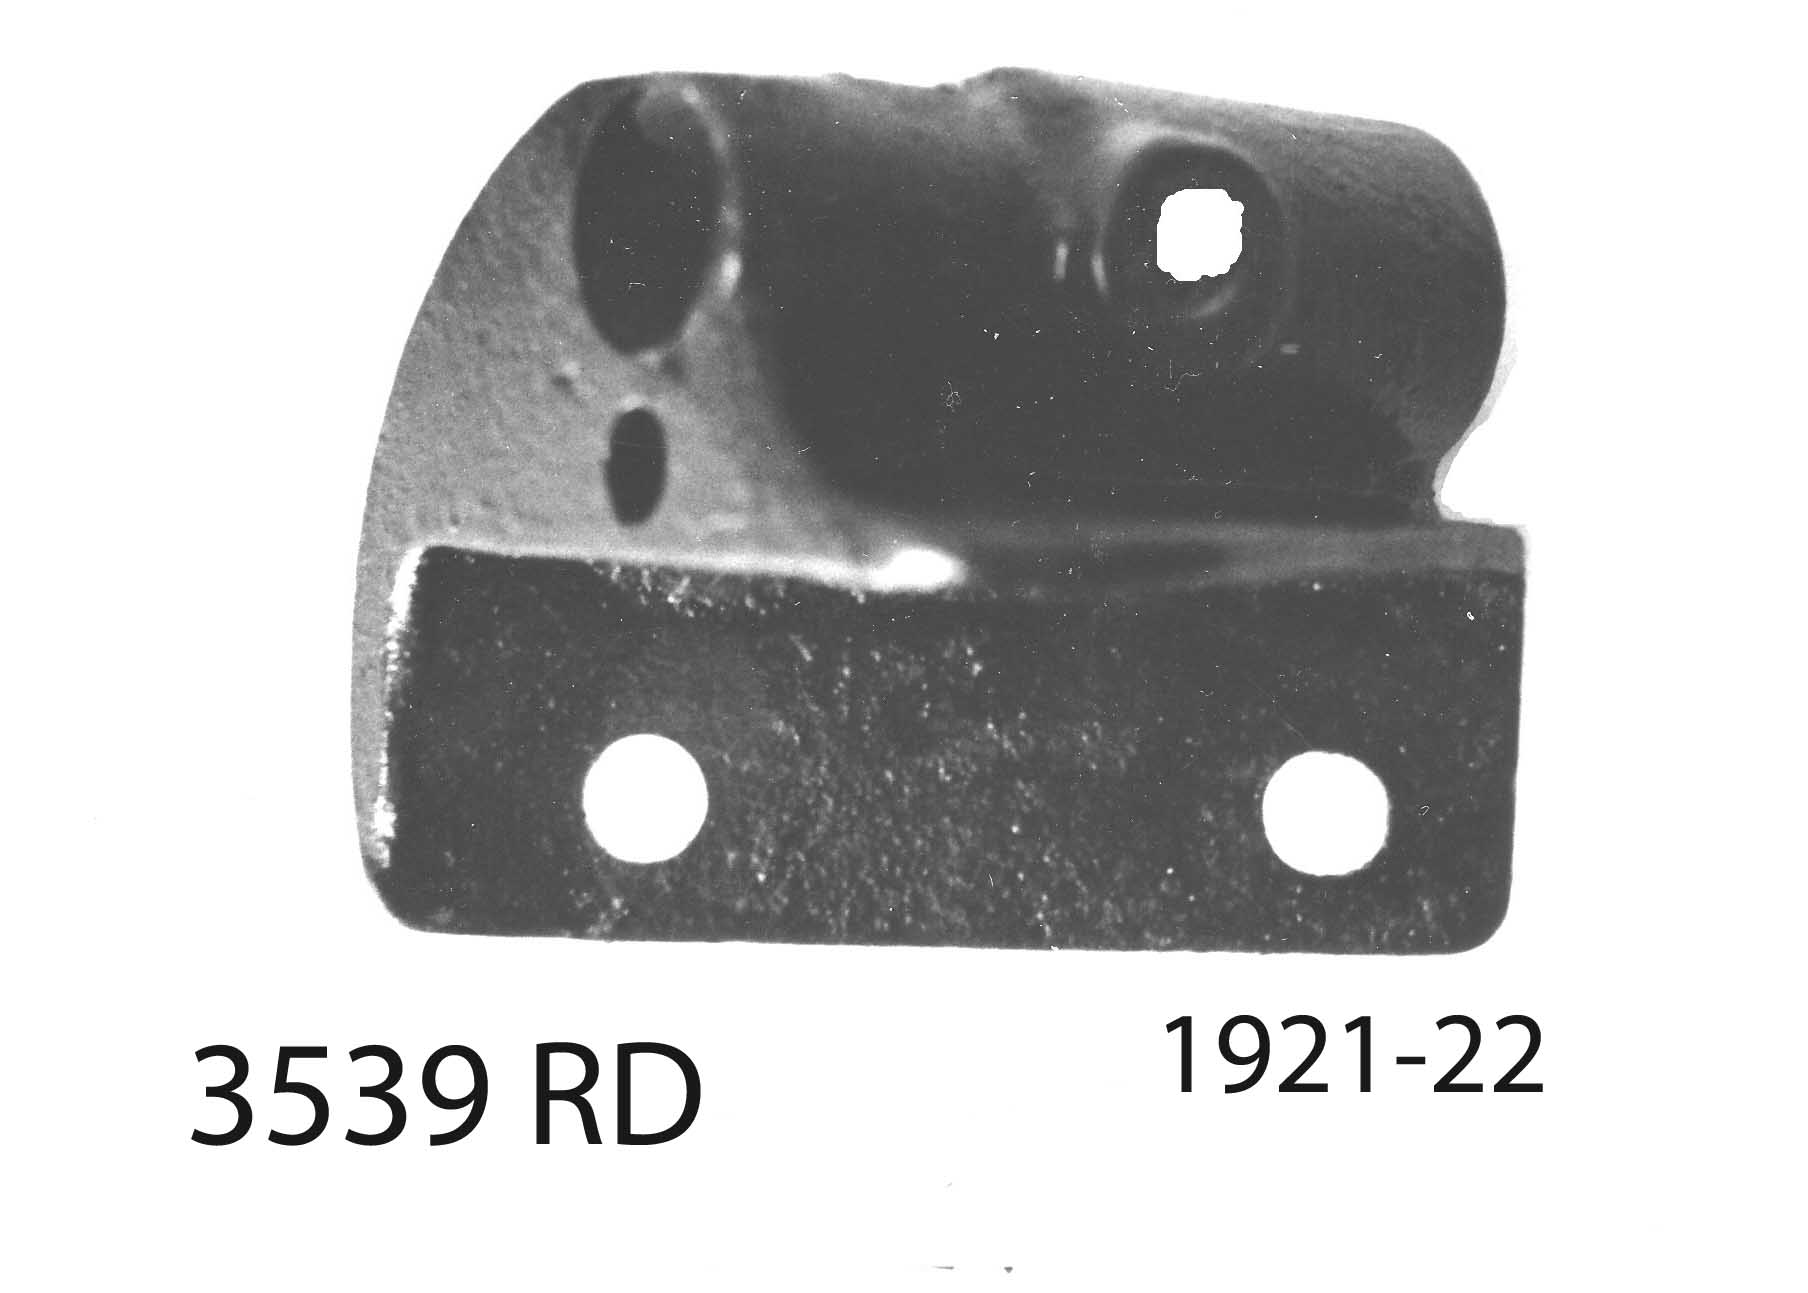 3539 RD